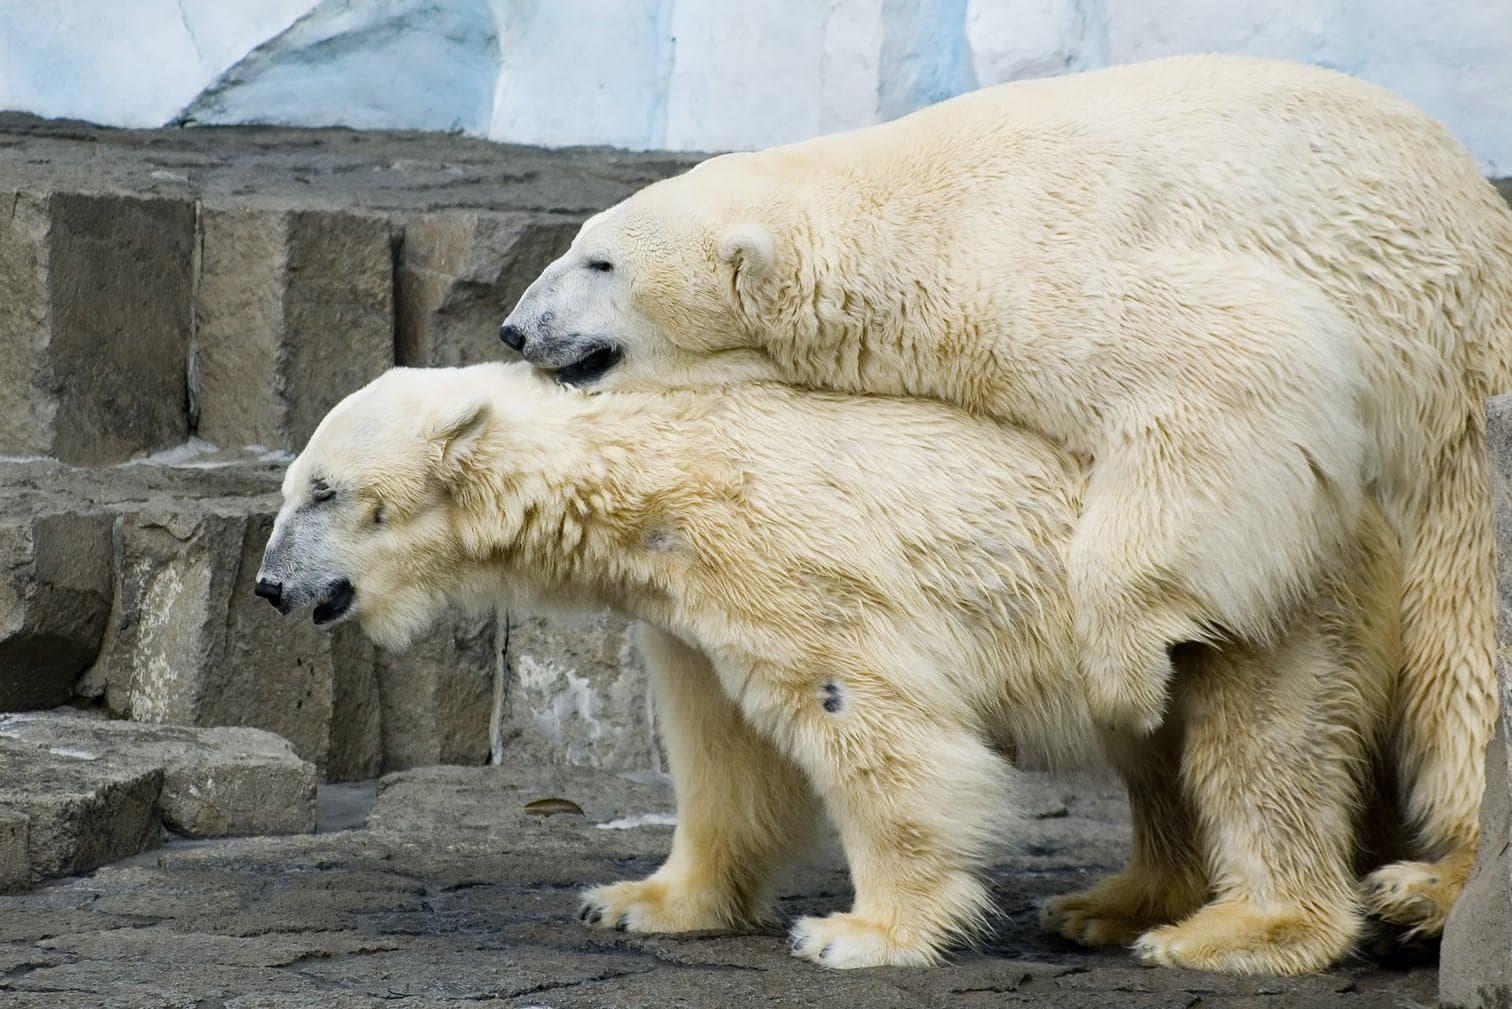 Foto: Ilya D. Gridnev / shutterstock.com